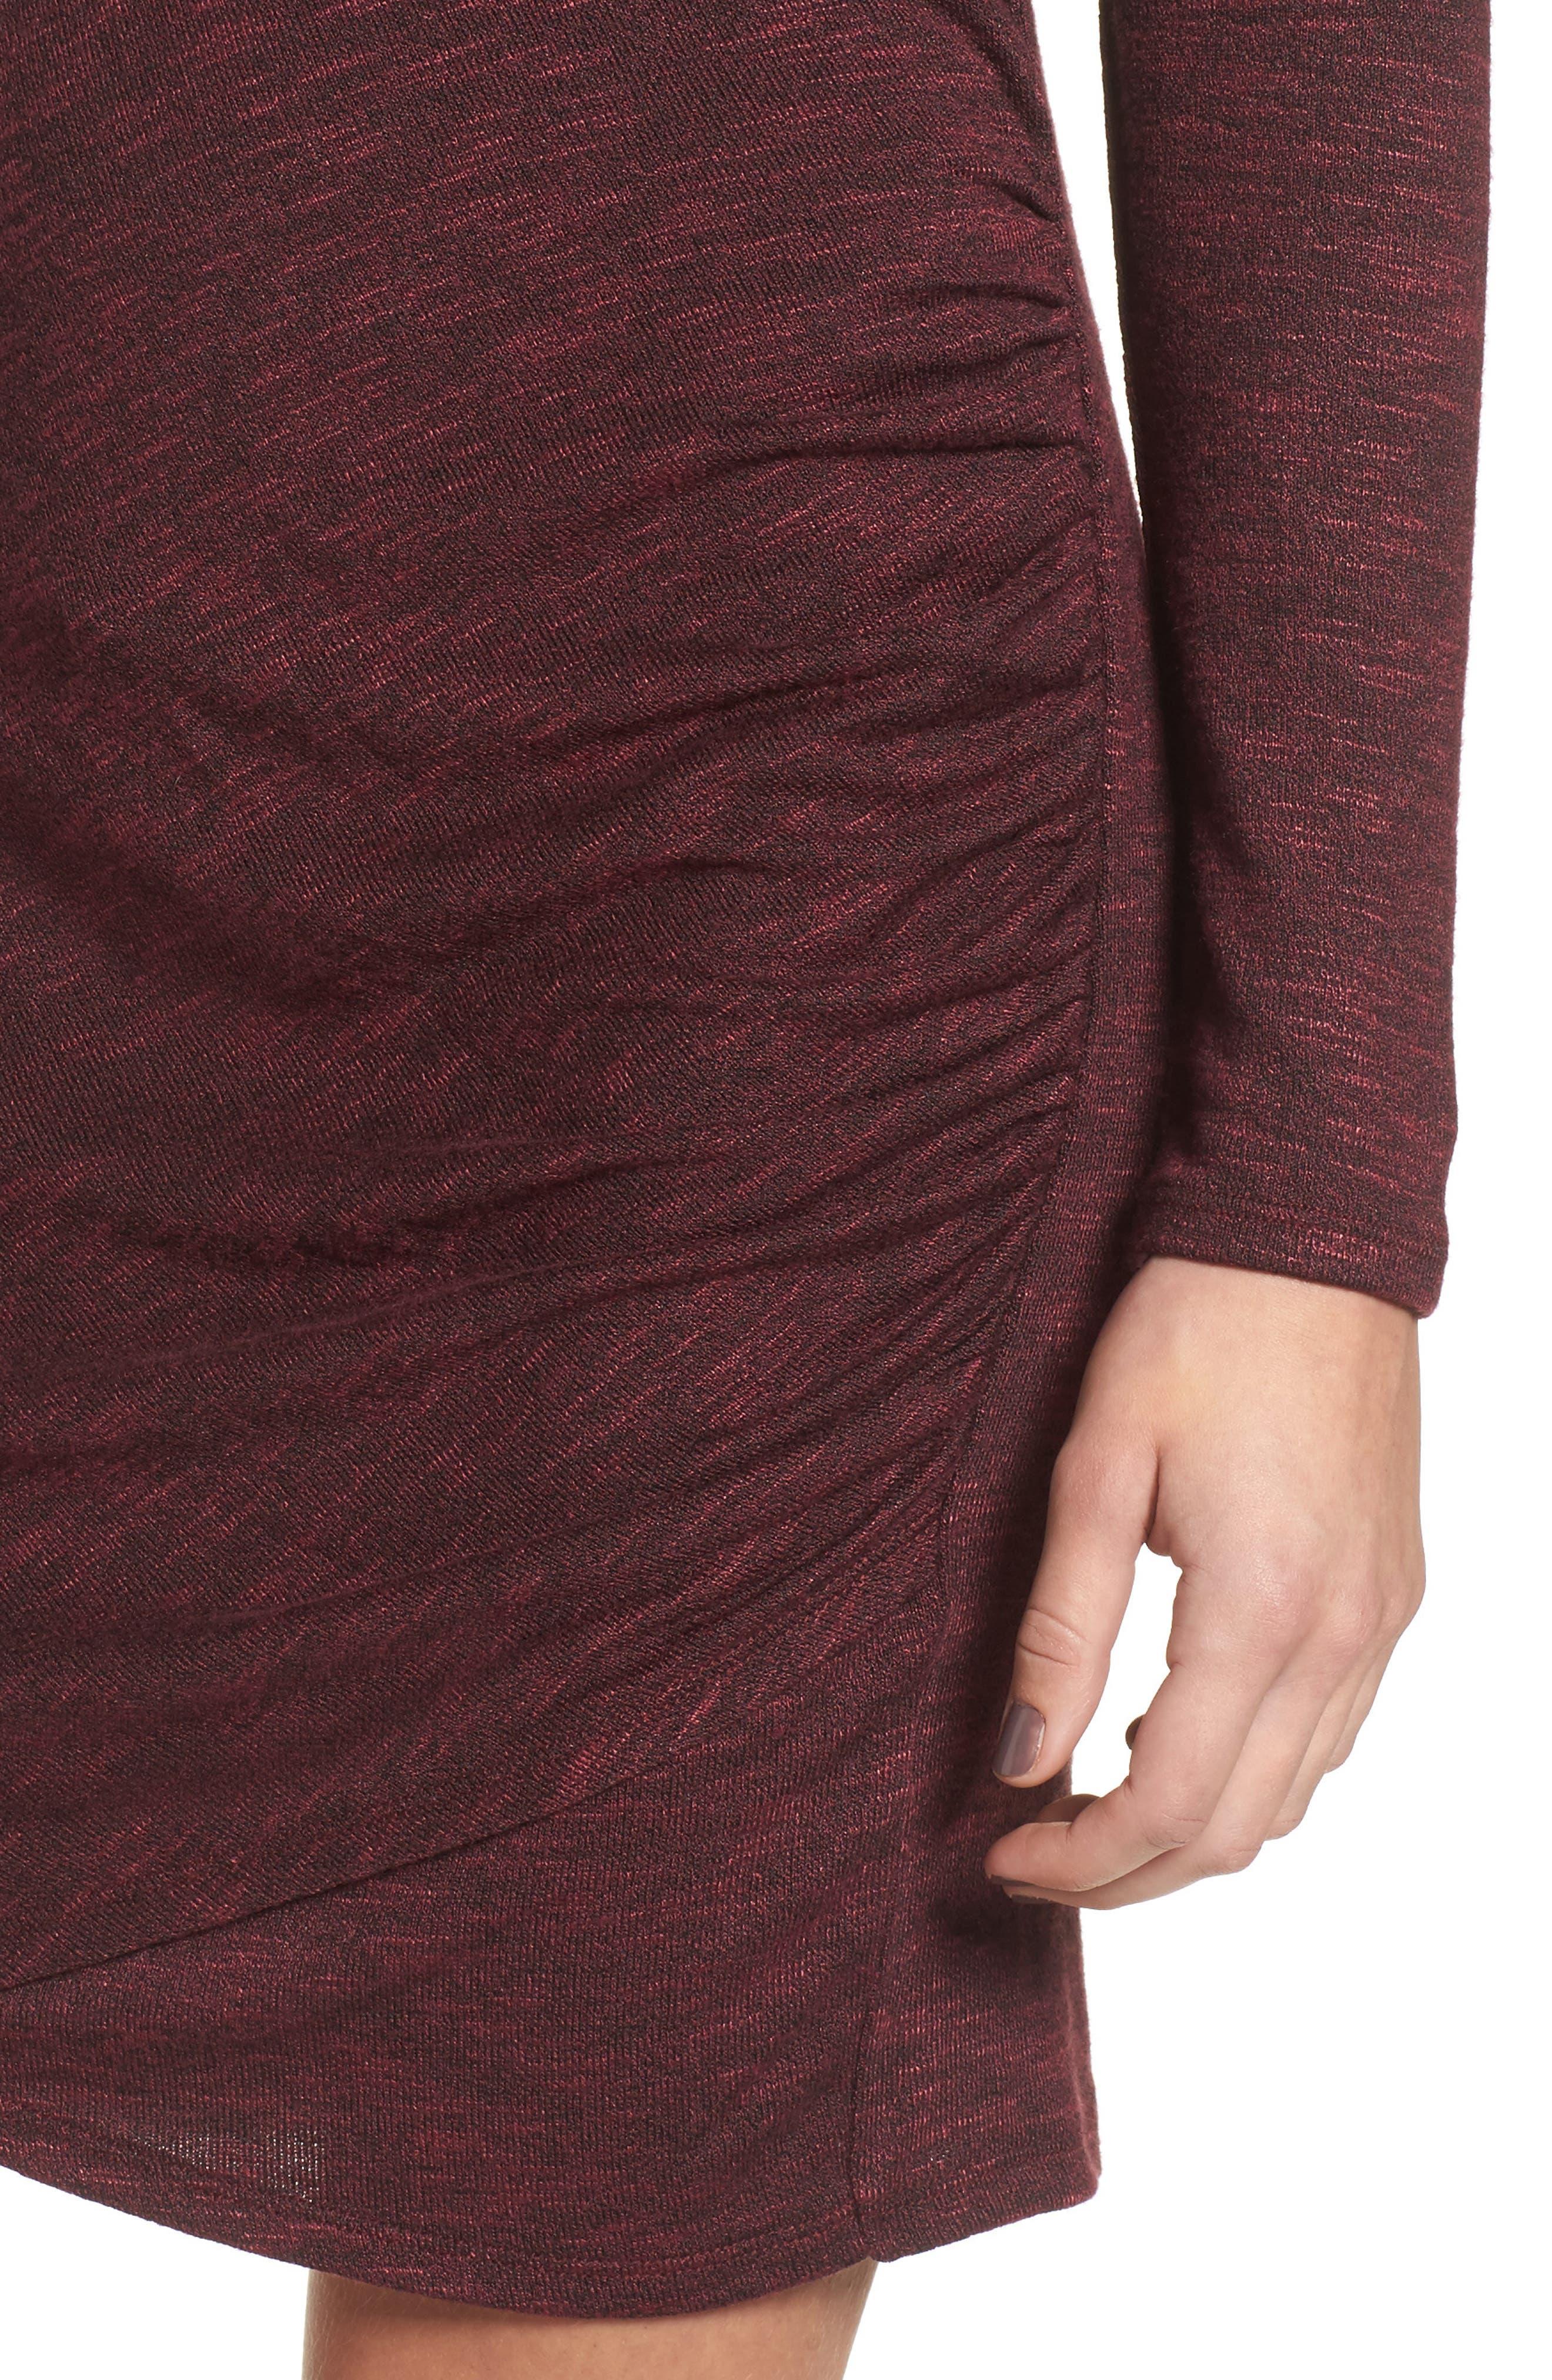 Ruched Knit Dress,                             Alternate thumbnail 4, color,                             Zinfandel